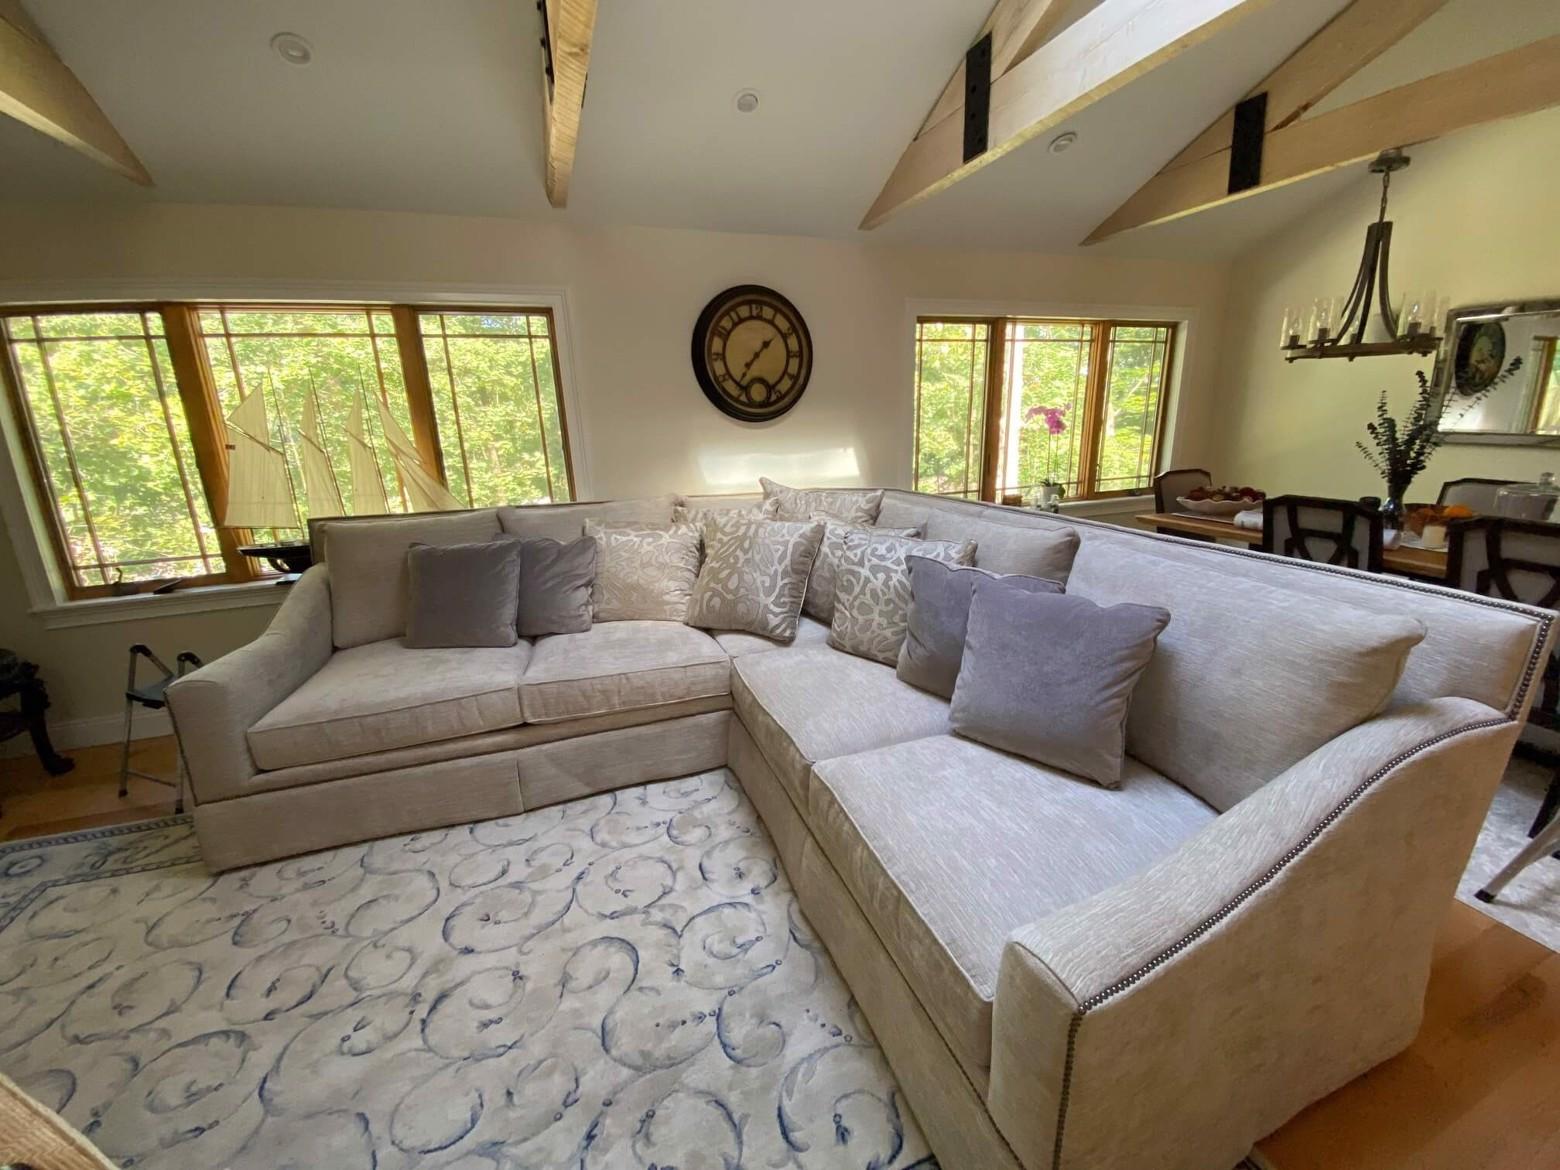 lorenza-ventura-living-room-1.jpeg image